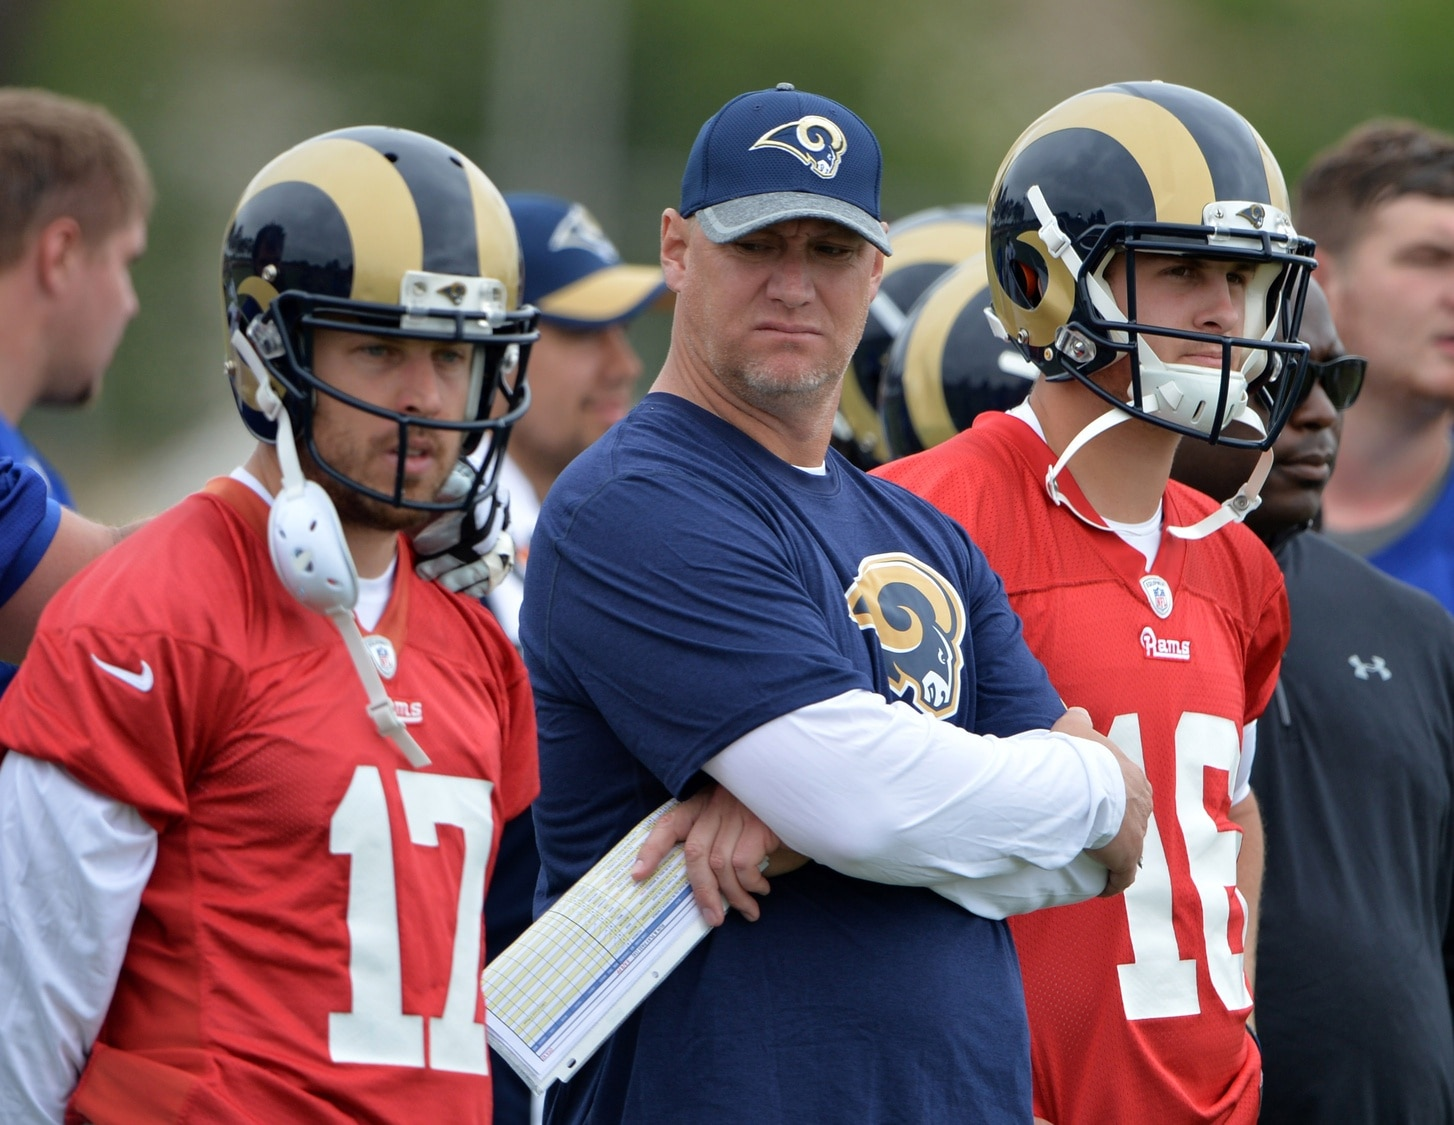 NFL veterans, Case Keenum, Jared Goff